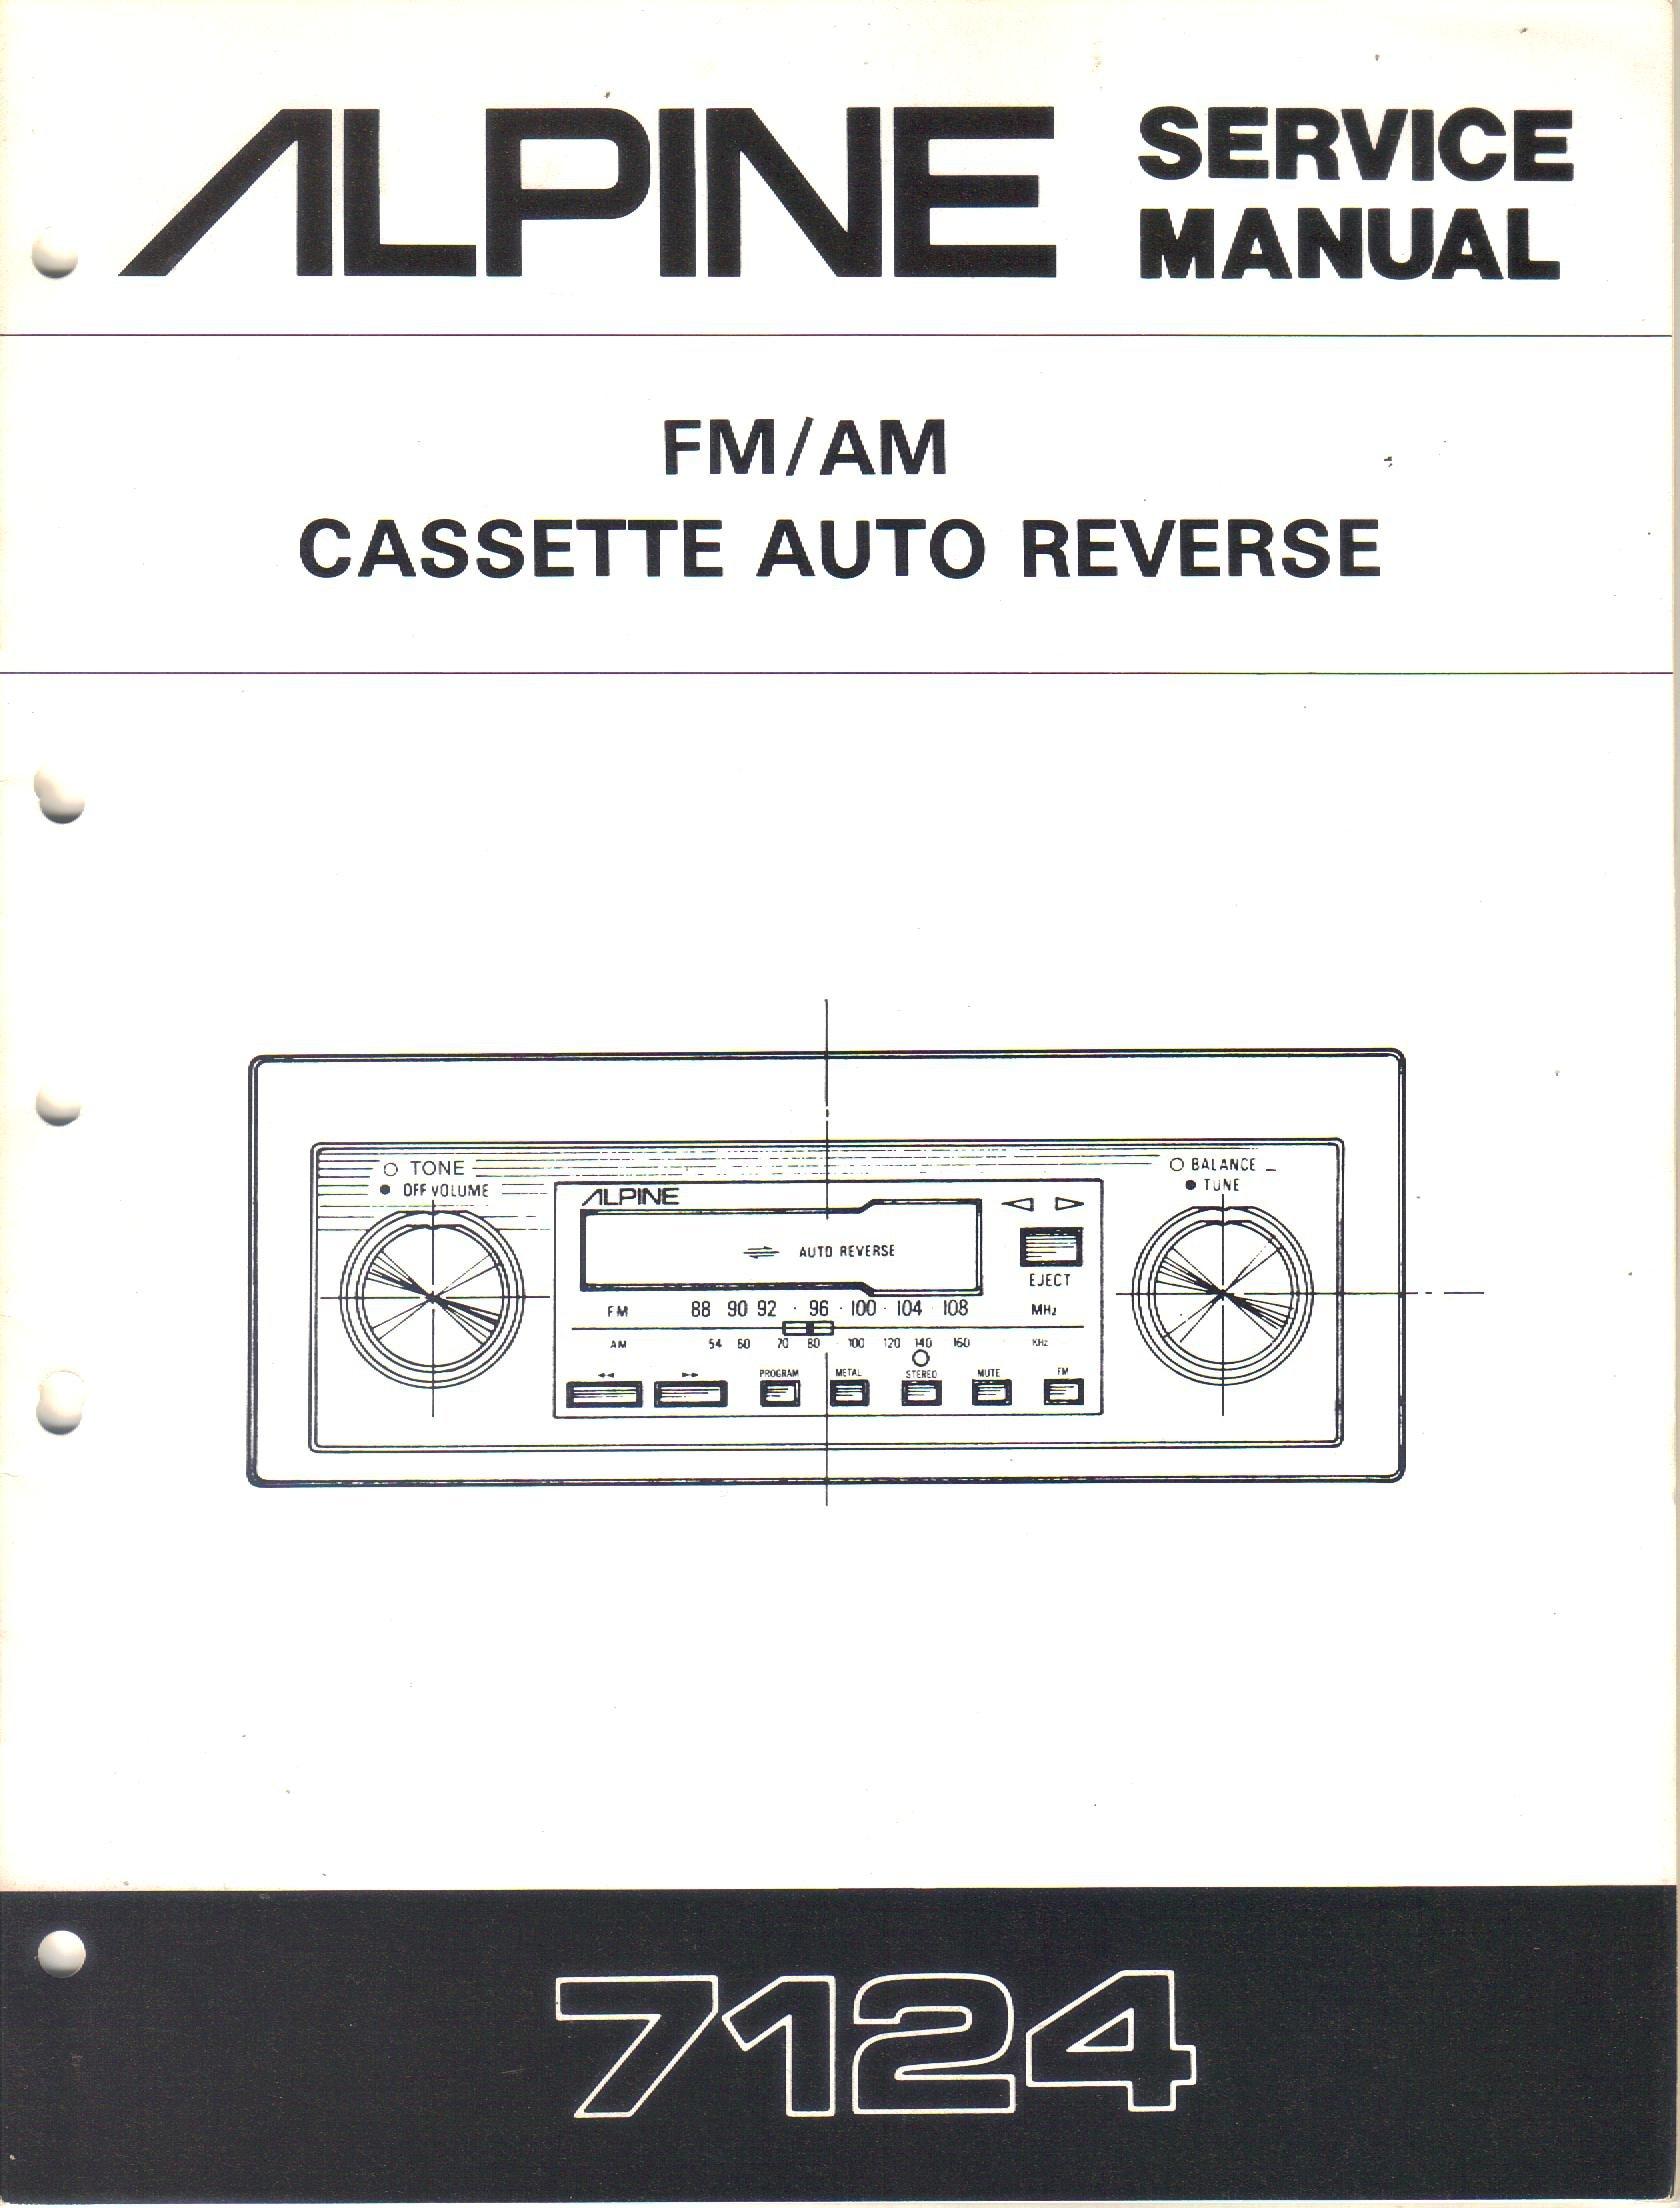 Alpine 7124 Preset AM FM Cassette Auto Reverse Car Stereo, Service Manual, Parts  List, Schematic Wiring Diagram: Alpine Electronics Inc, not stated:  Amazon.com: BooksAmazon.com